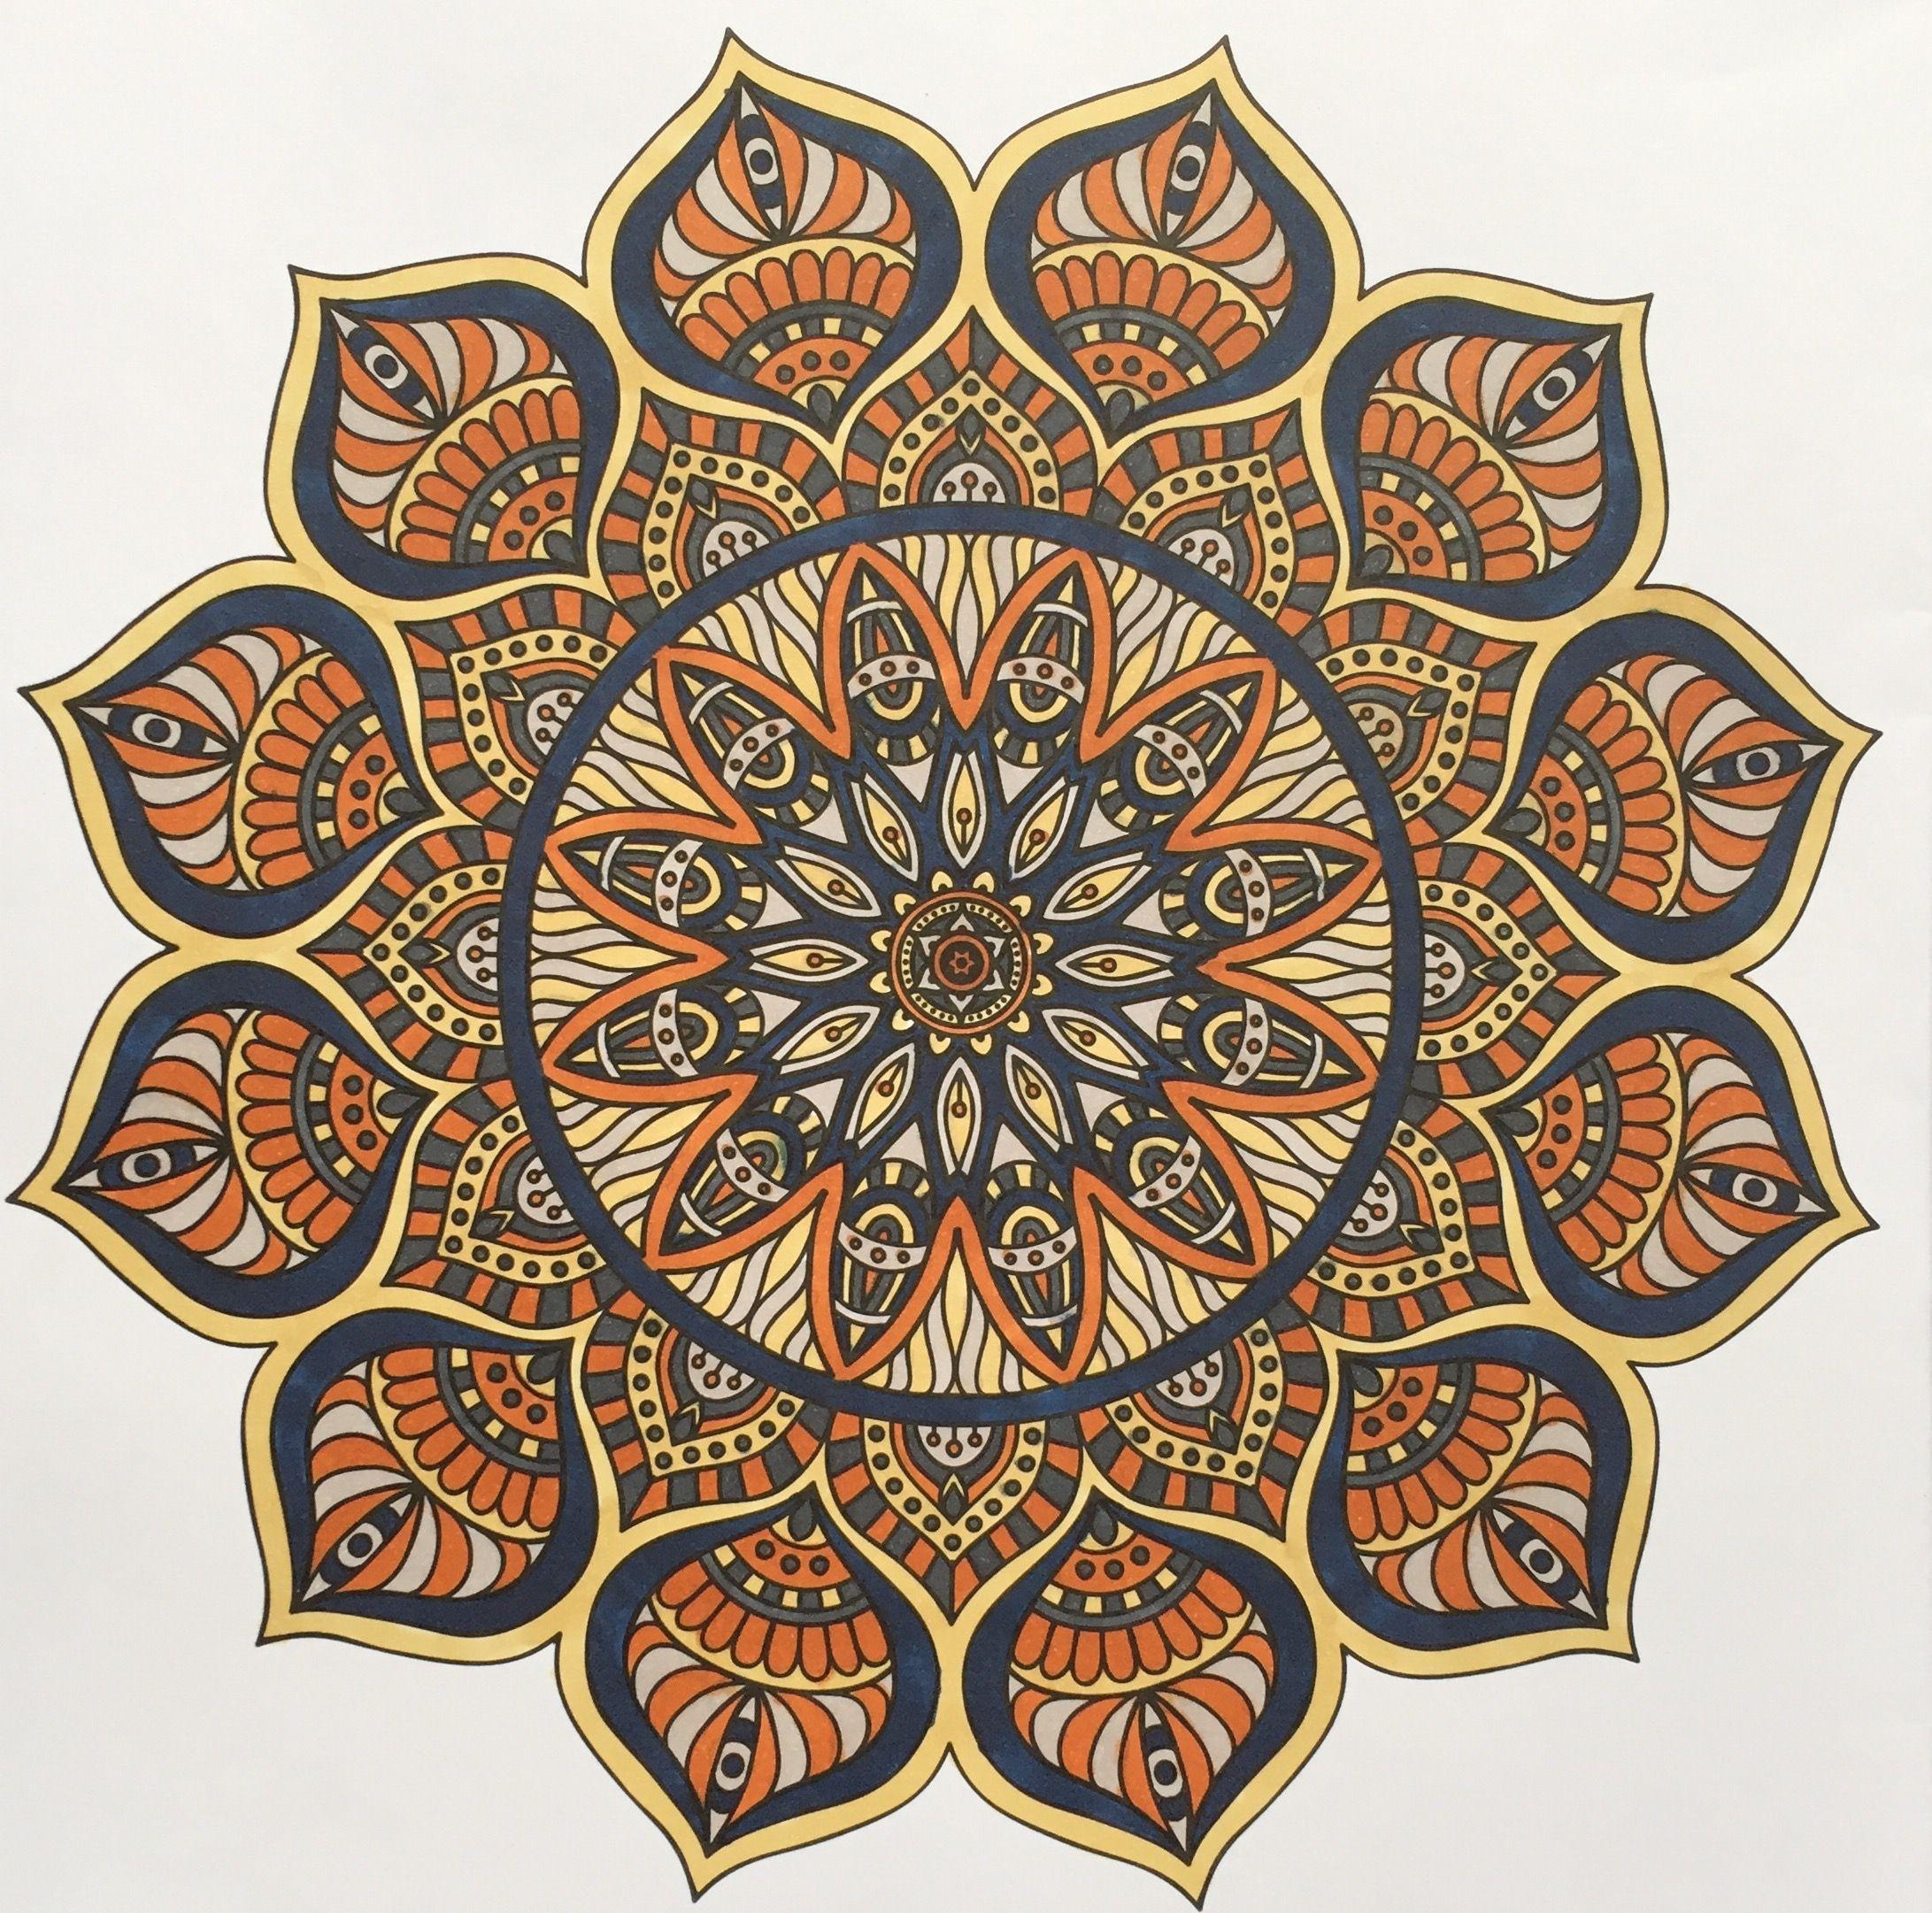 Pin de Cin Franken en Mandala by Cin | Pinterest | Mandalas